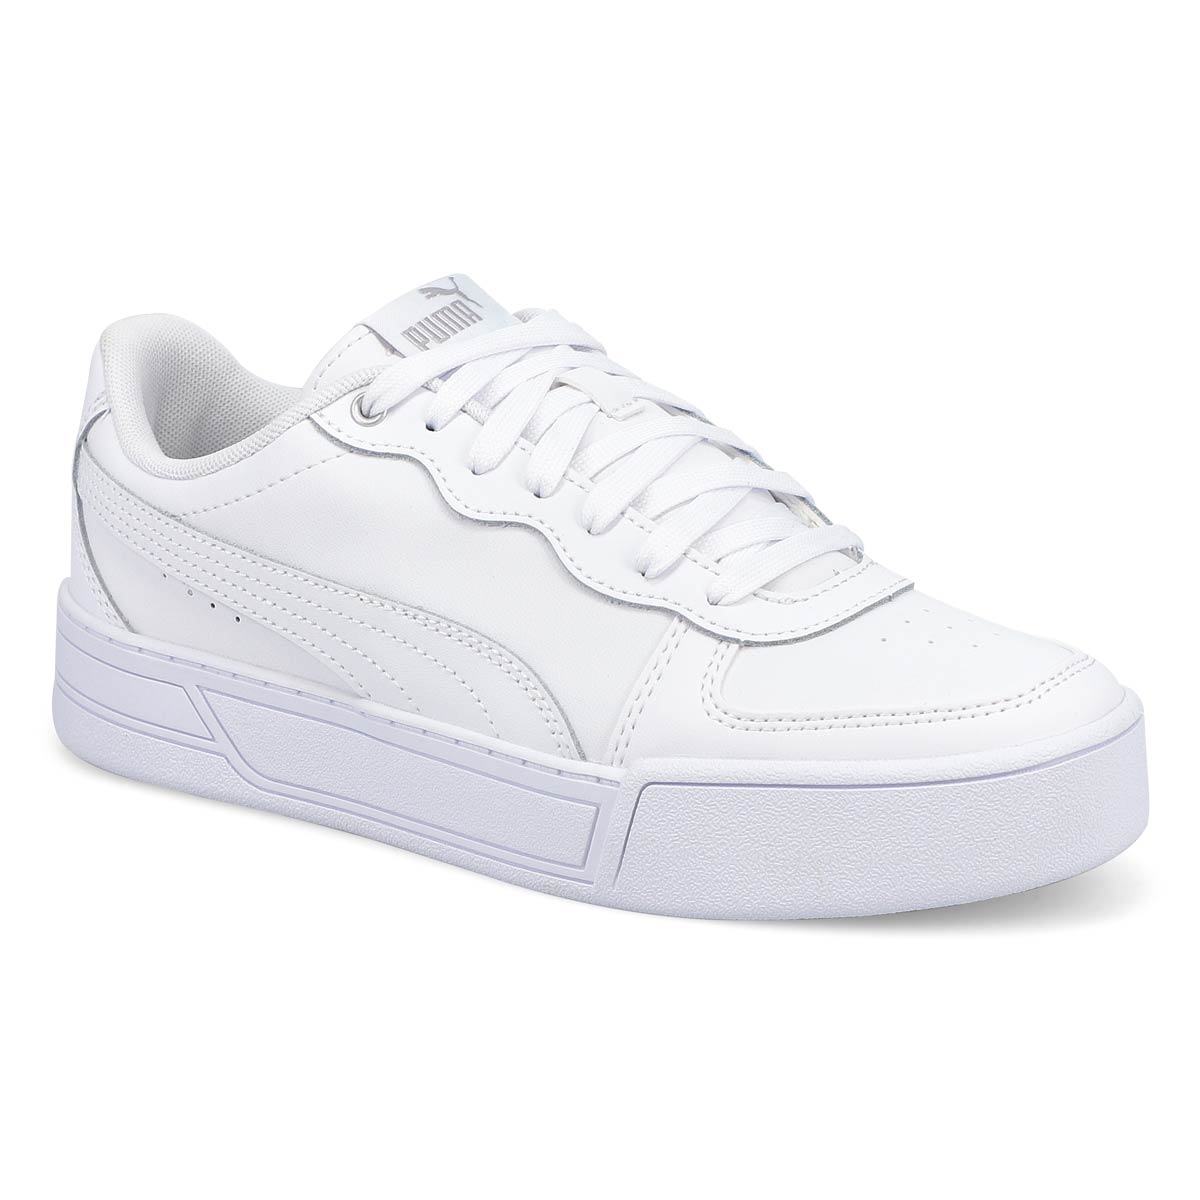 Women's Puma Skye Sneaker - White/White